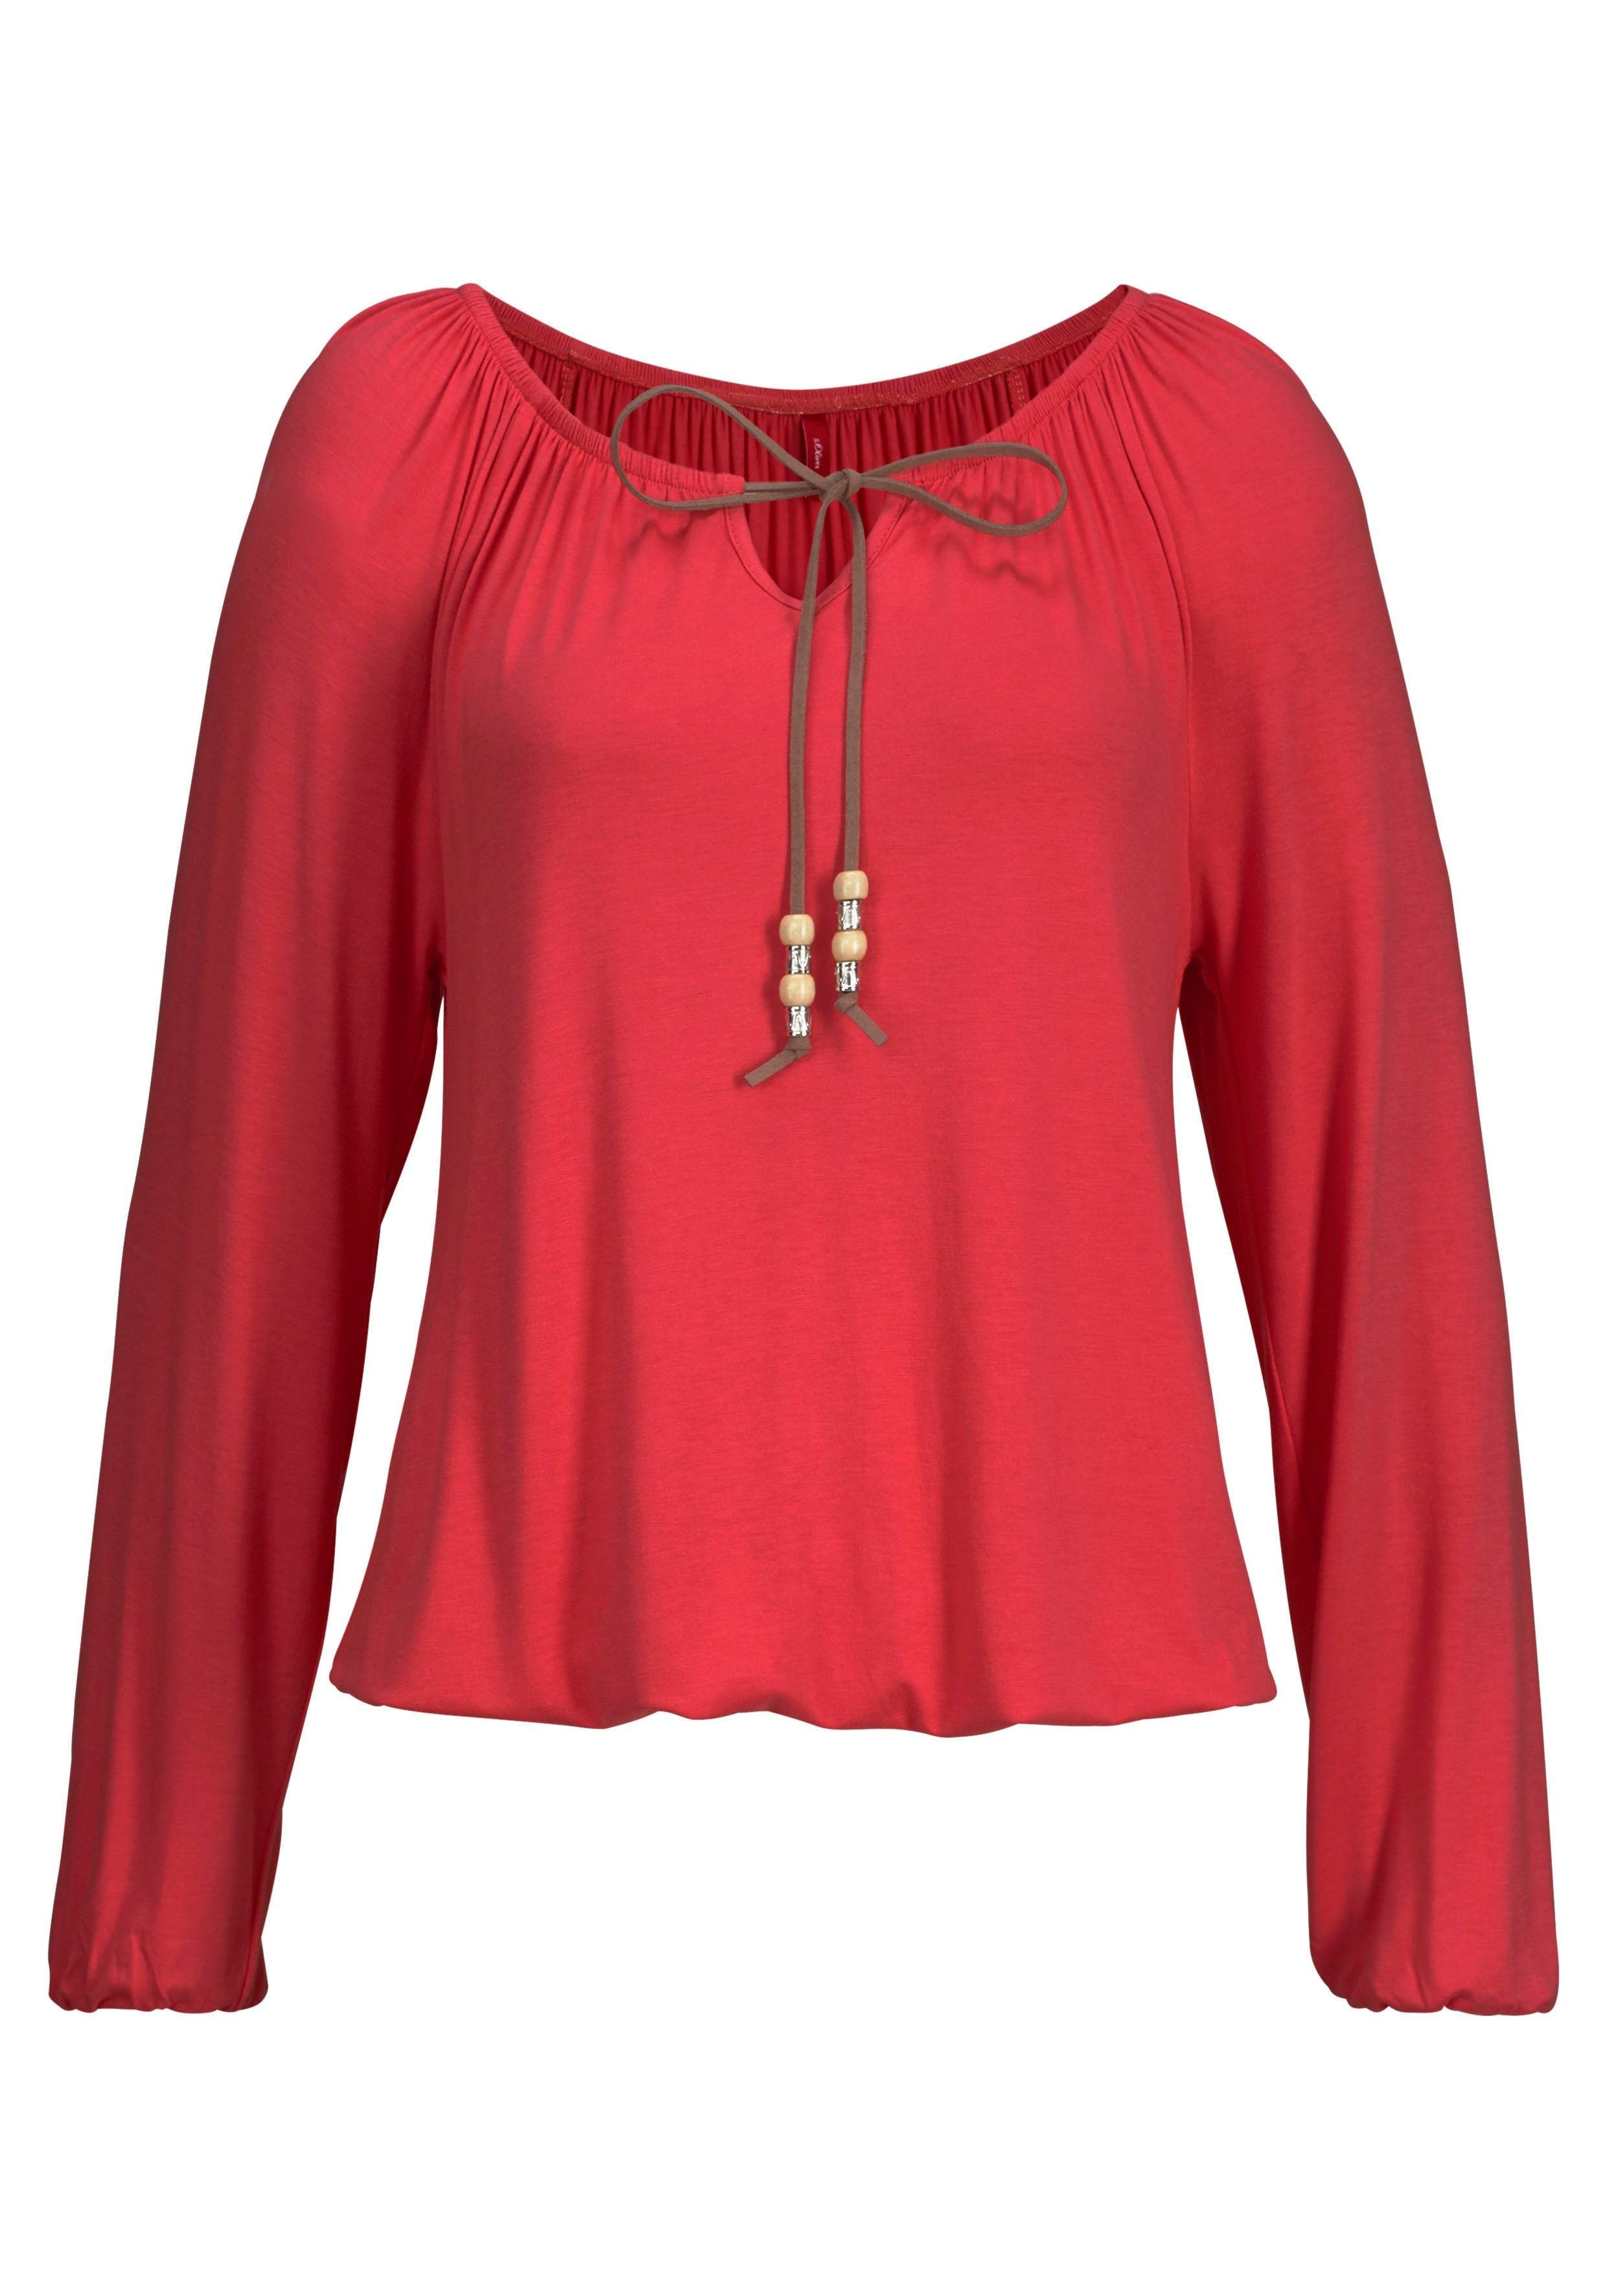 s.Oliver Beachwear S.OLIVER RED LABEL Beachwear strandshirt in de webshop van OTTO kopen